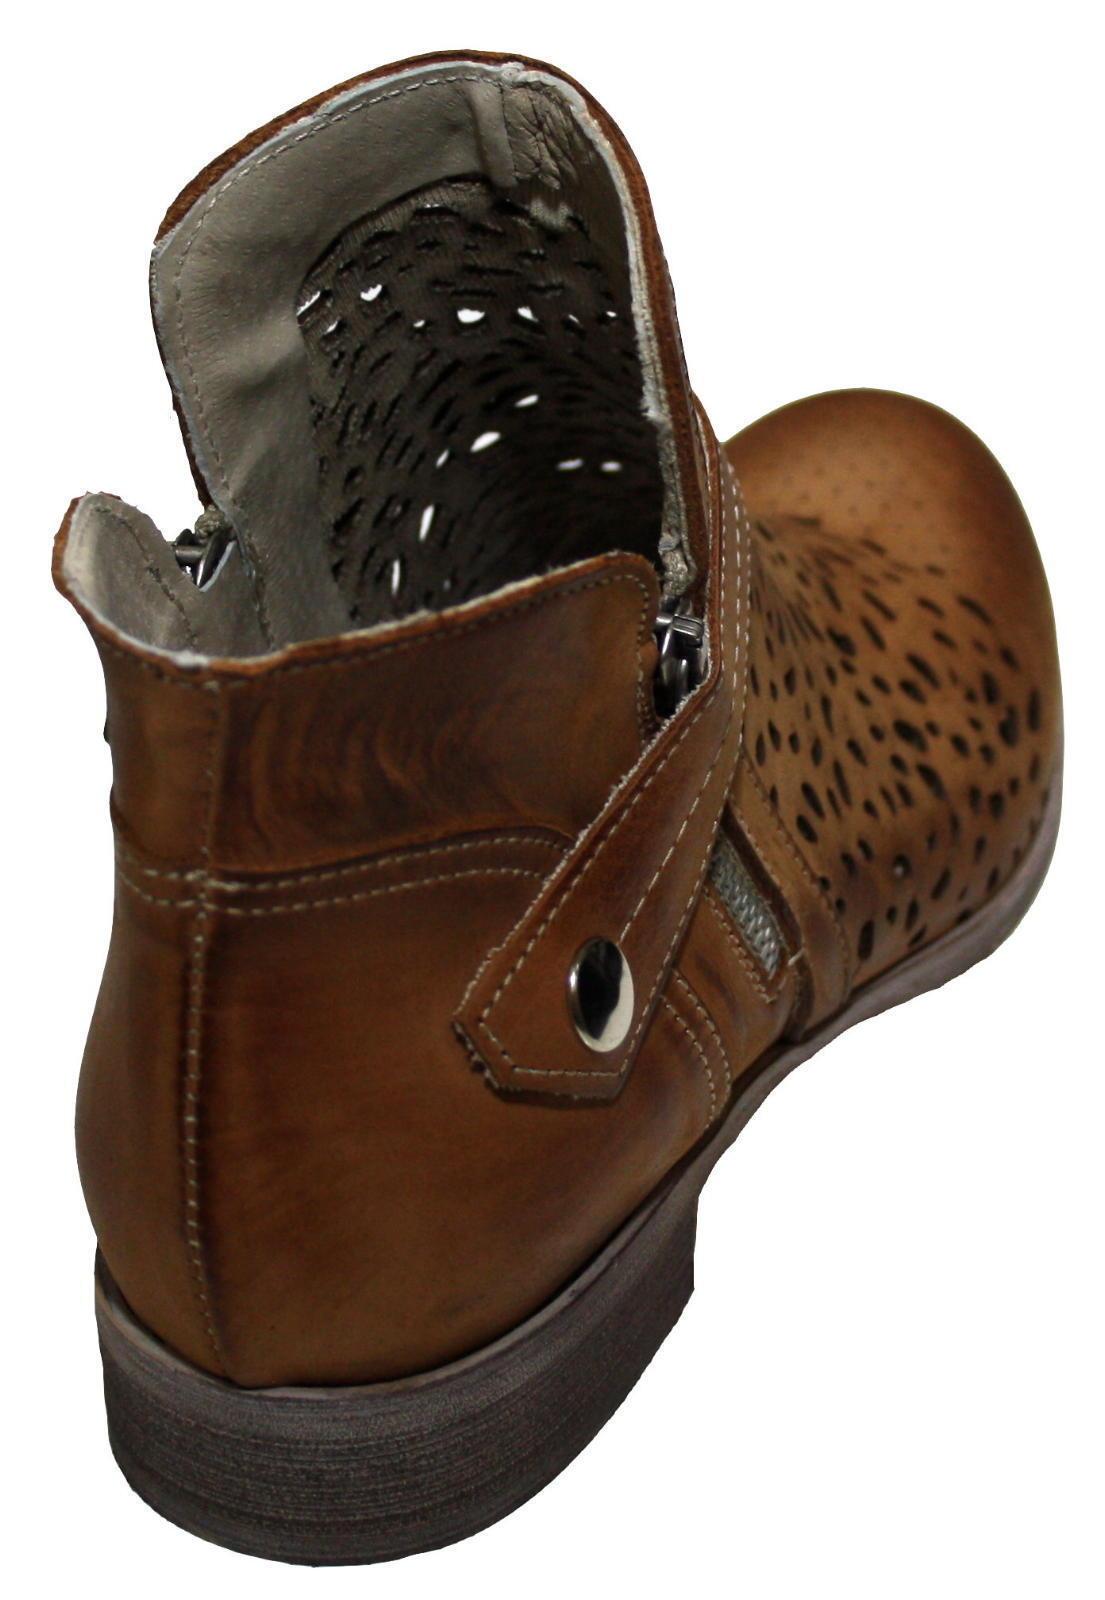 846 Damen Leder Stiefel Stiefeletten Gurt Reißverschlüße kurz braun 37 37 braun 38 39 40 0d4cb6